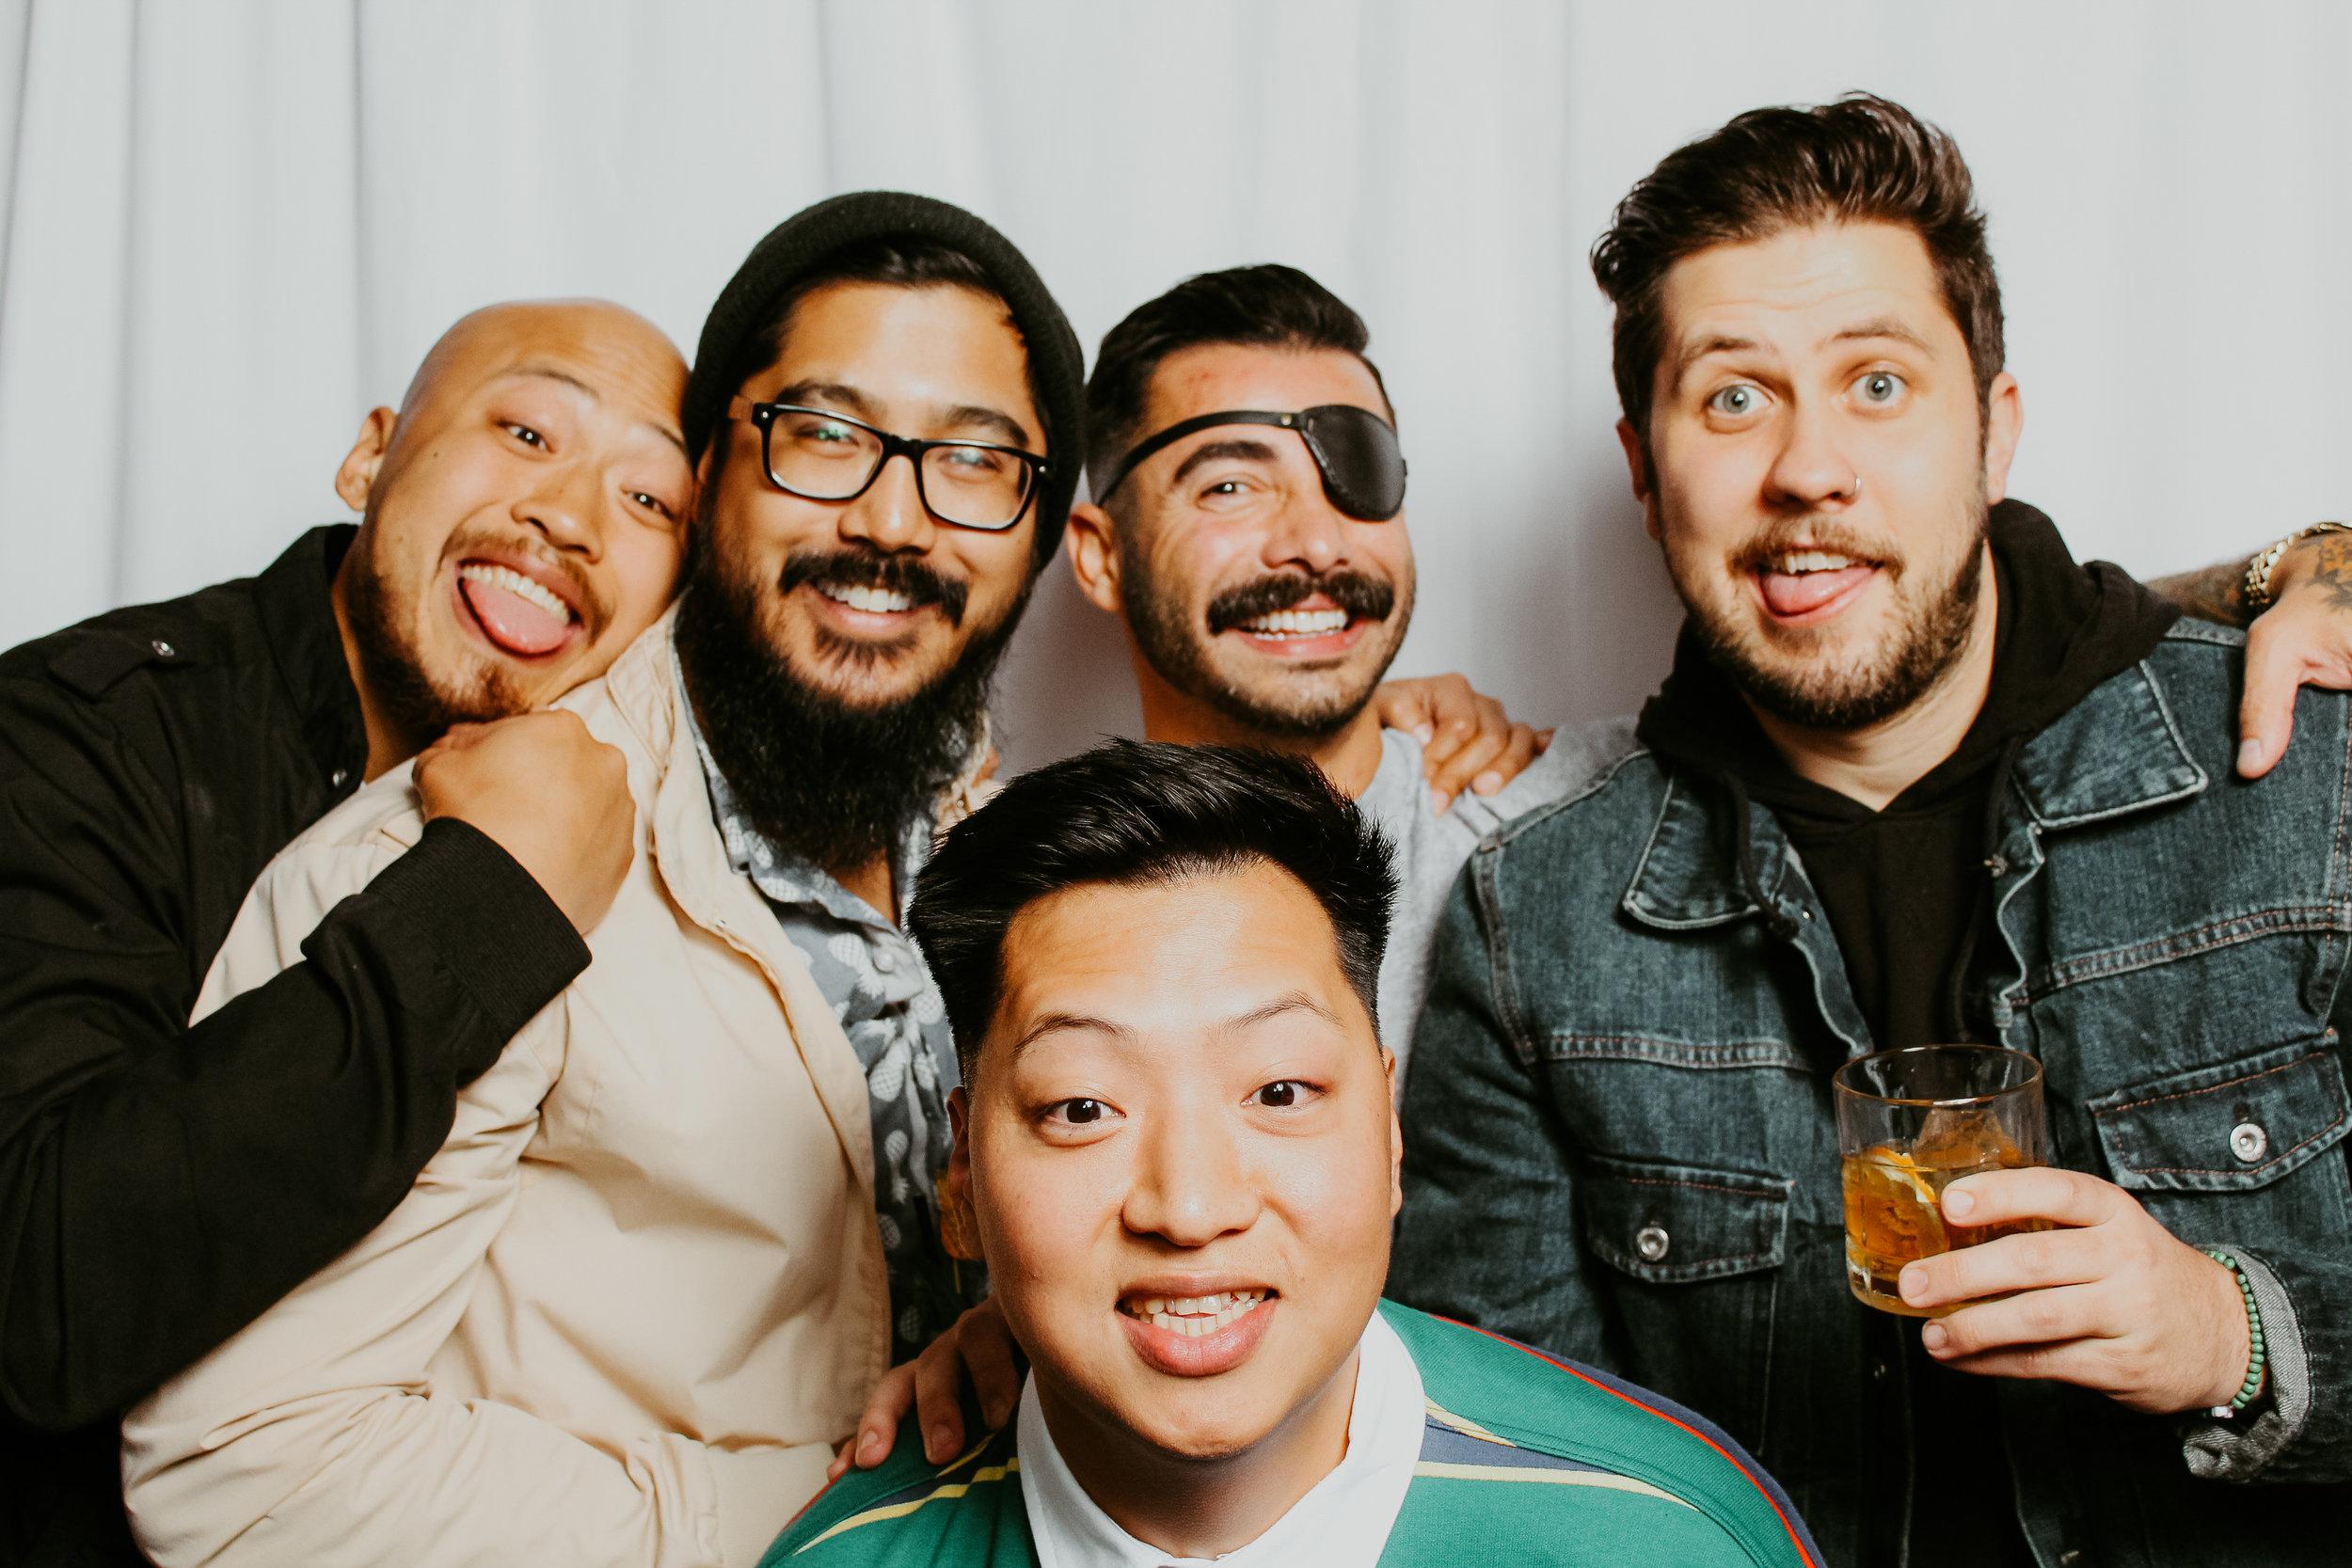 San Diego Wedding Photobooth Rental